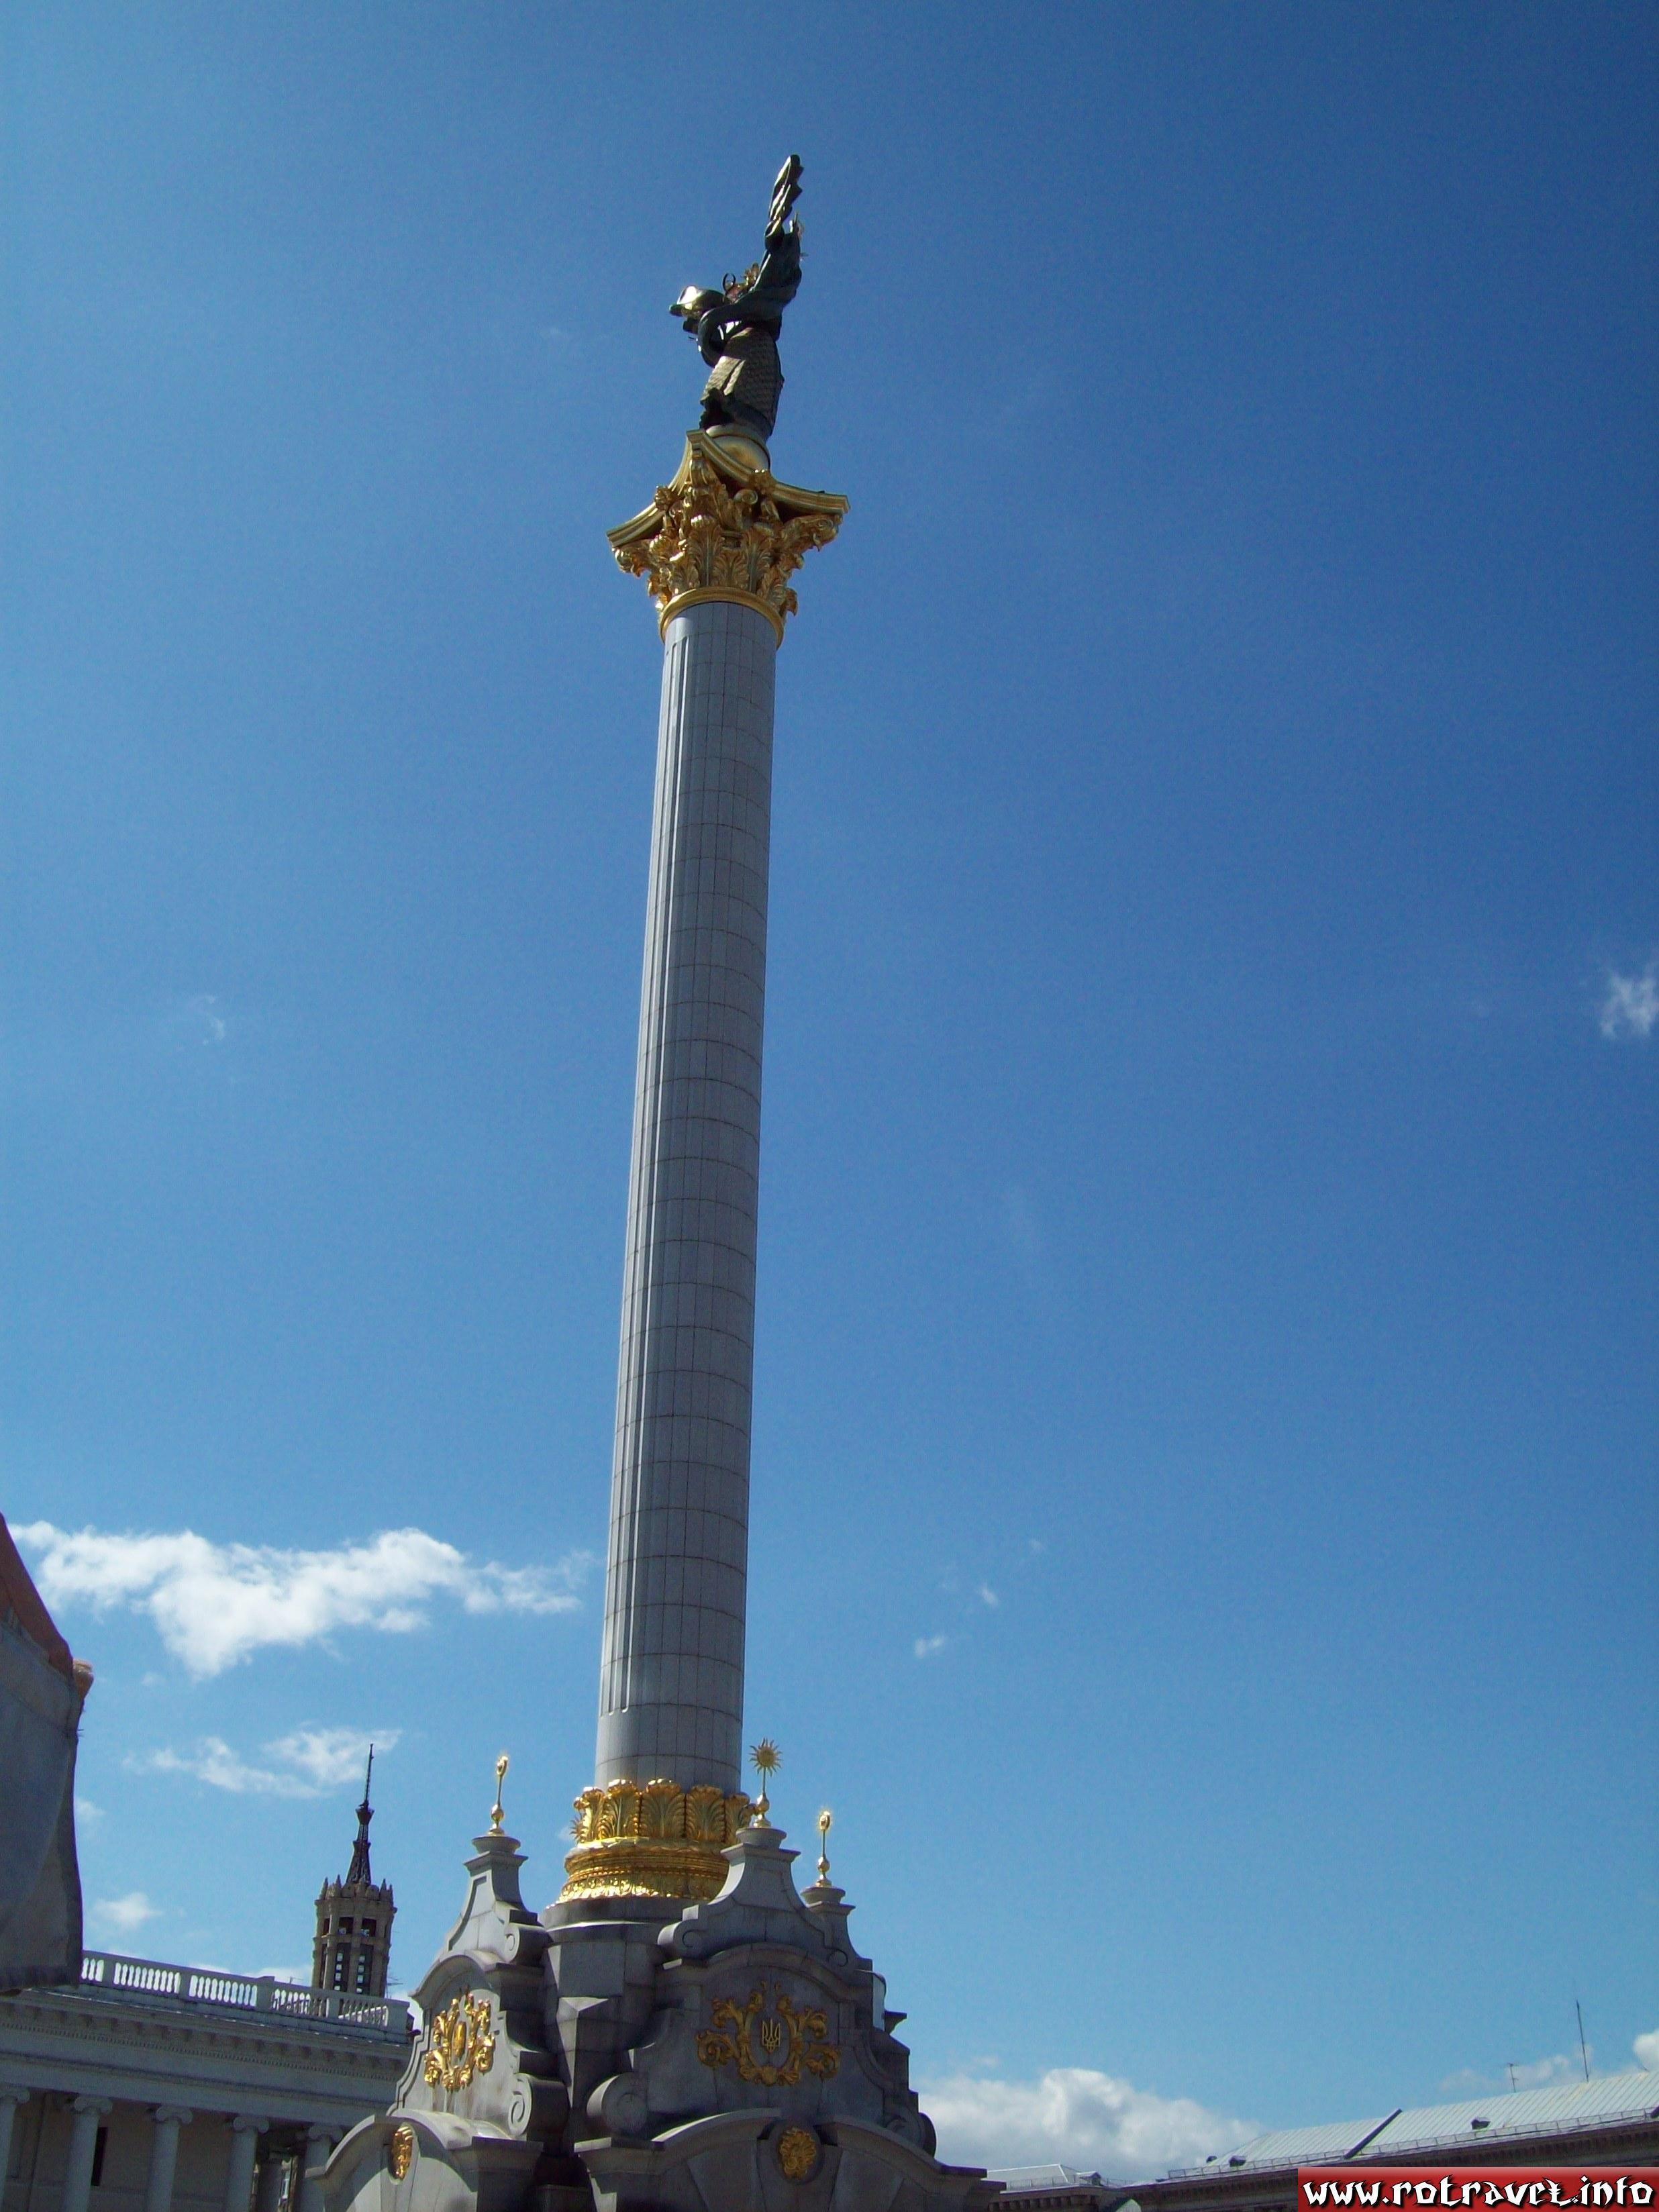 "The monument of Berehynia from Independence Square ""Maidan Nezalezhnosti"" (Ukrainian: Майдан Незалежності"